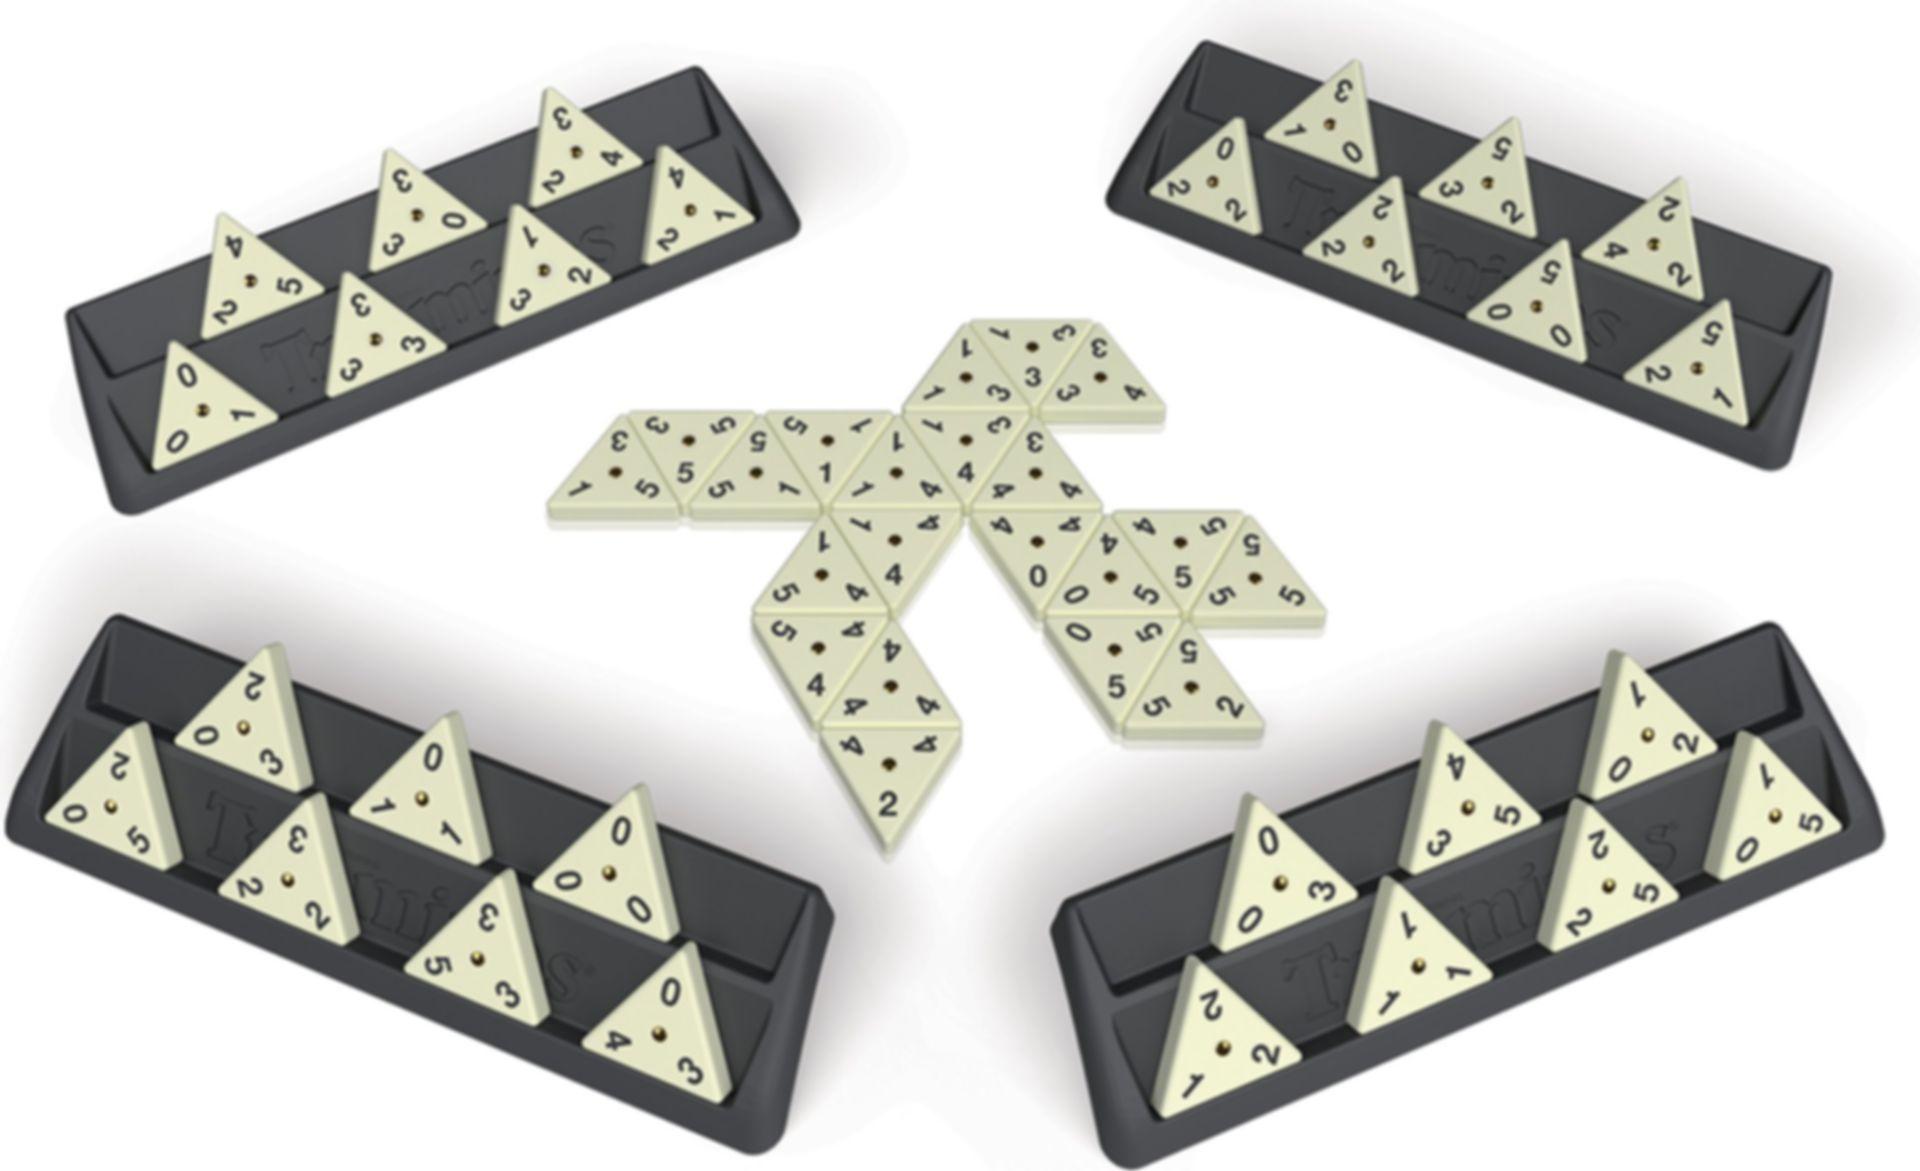 Tri-Ominos gameplay